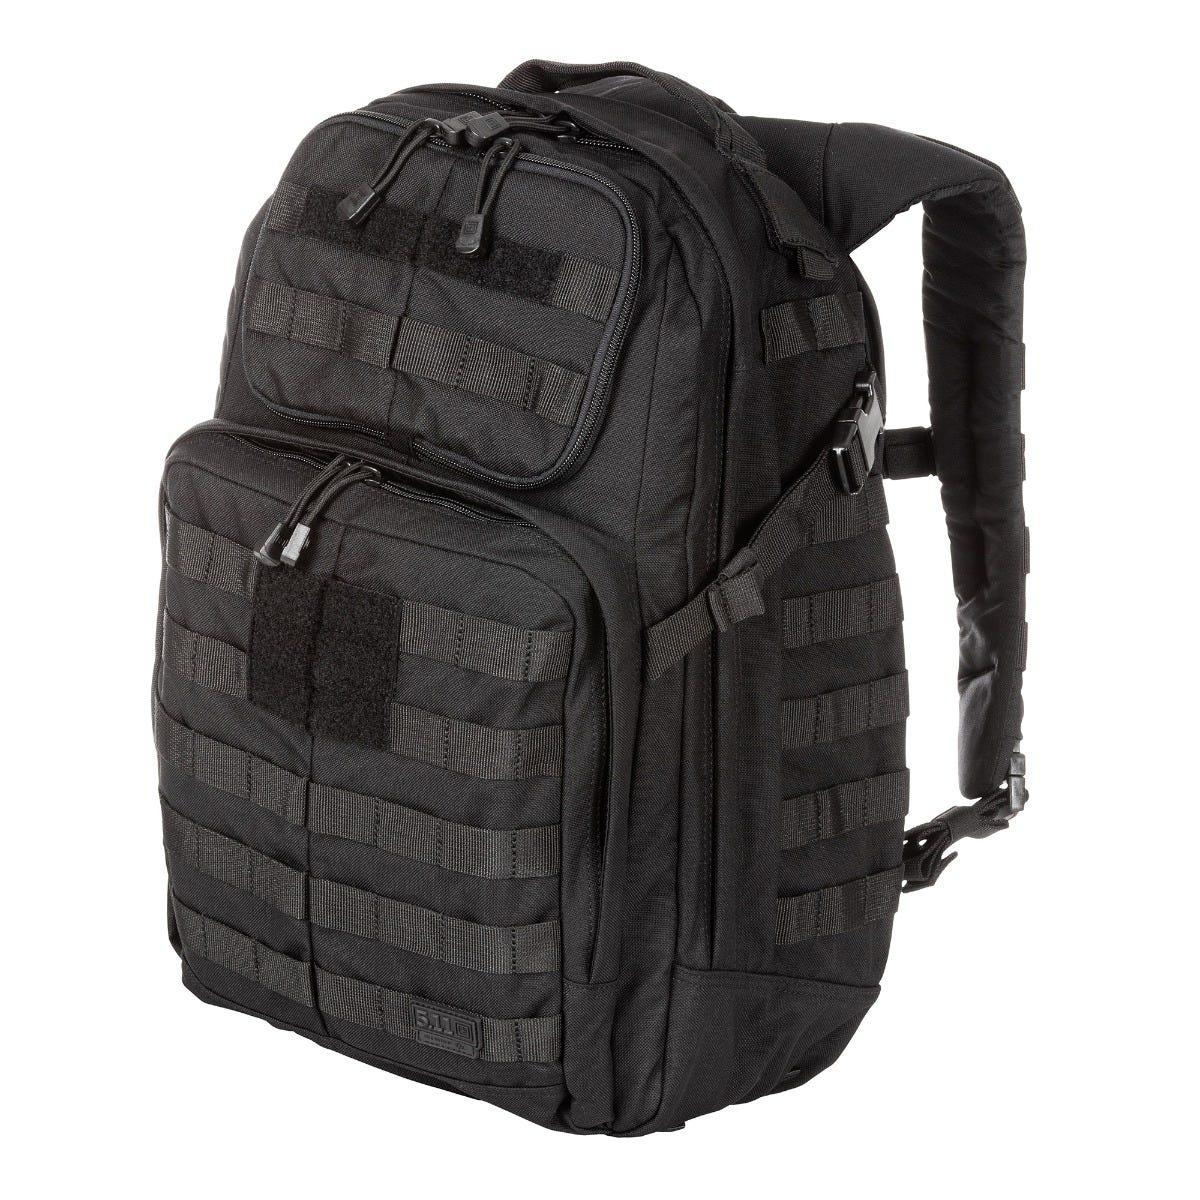 5.11 Tactical RUSH24 Backpack (Black)